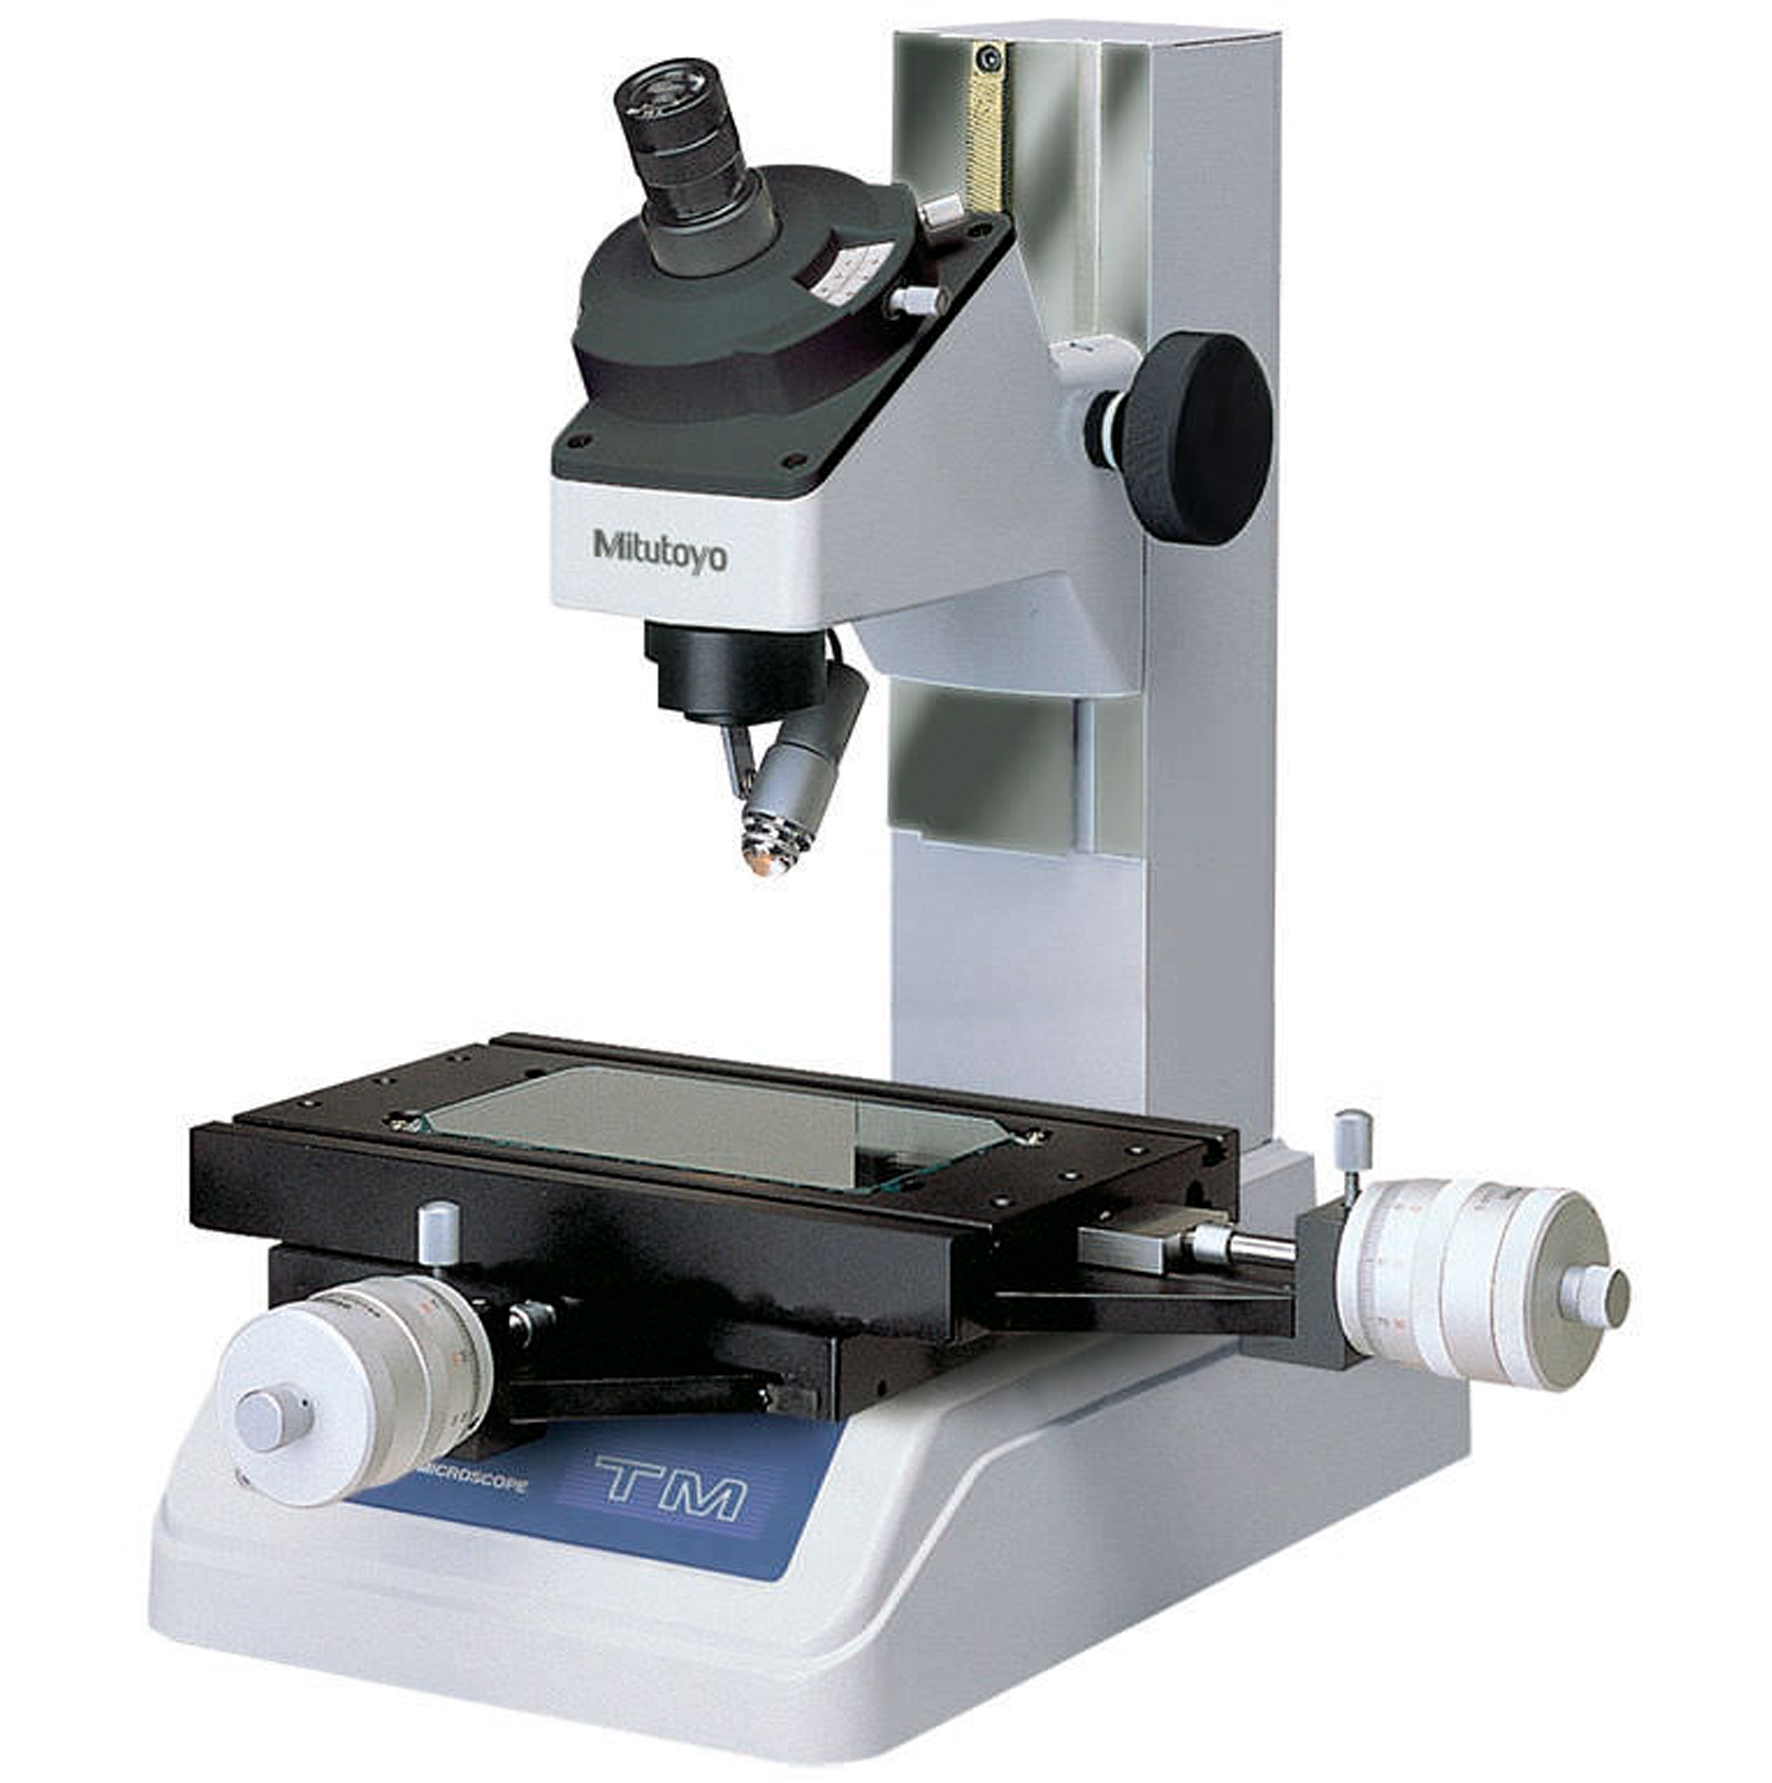 Microscopio de medición Alta exactitud Hyper MF/MF-U (HyperMF-B2515B, HyperMF-UB